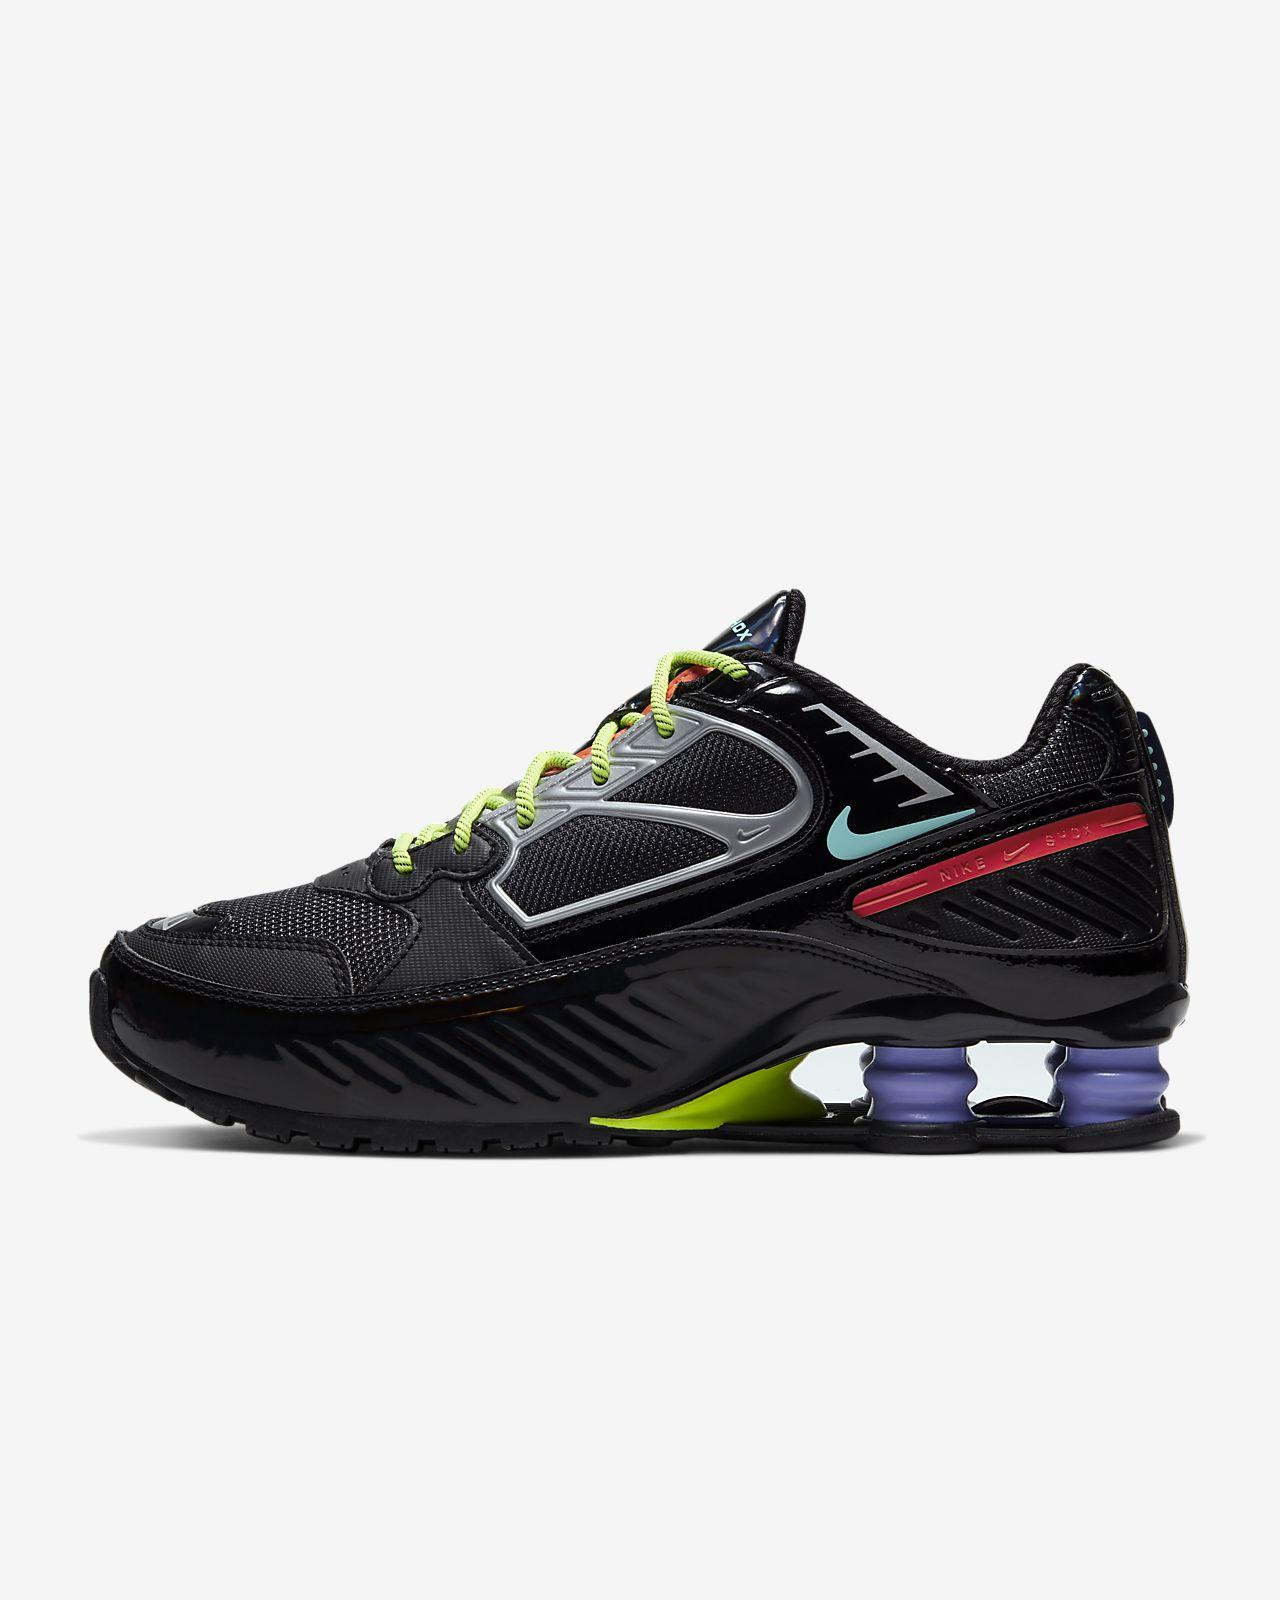 Nike Shox Enigma Damenschuh